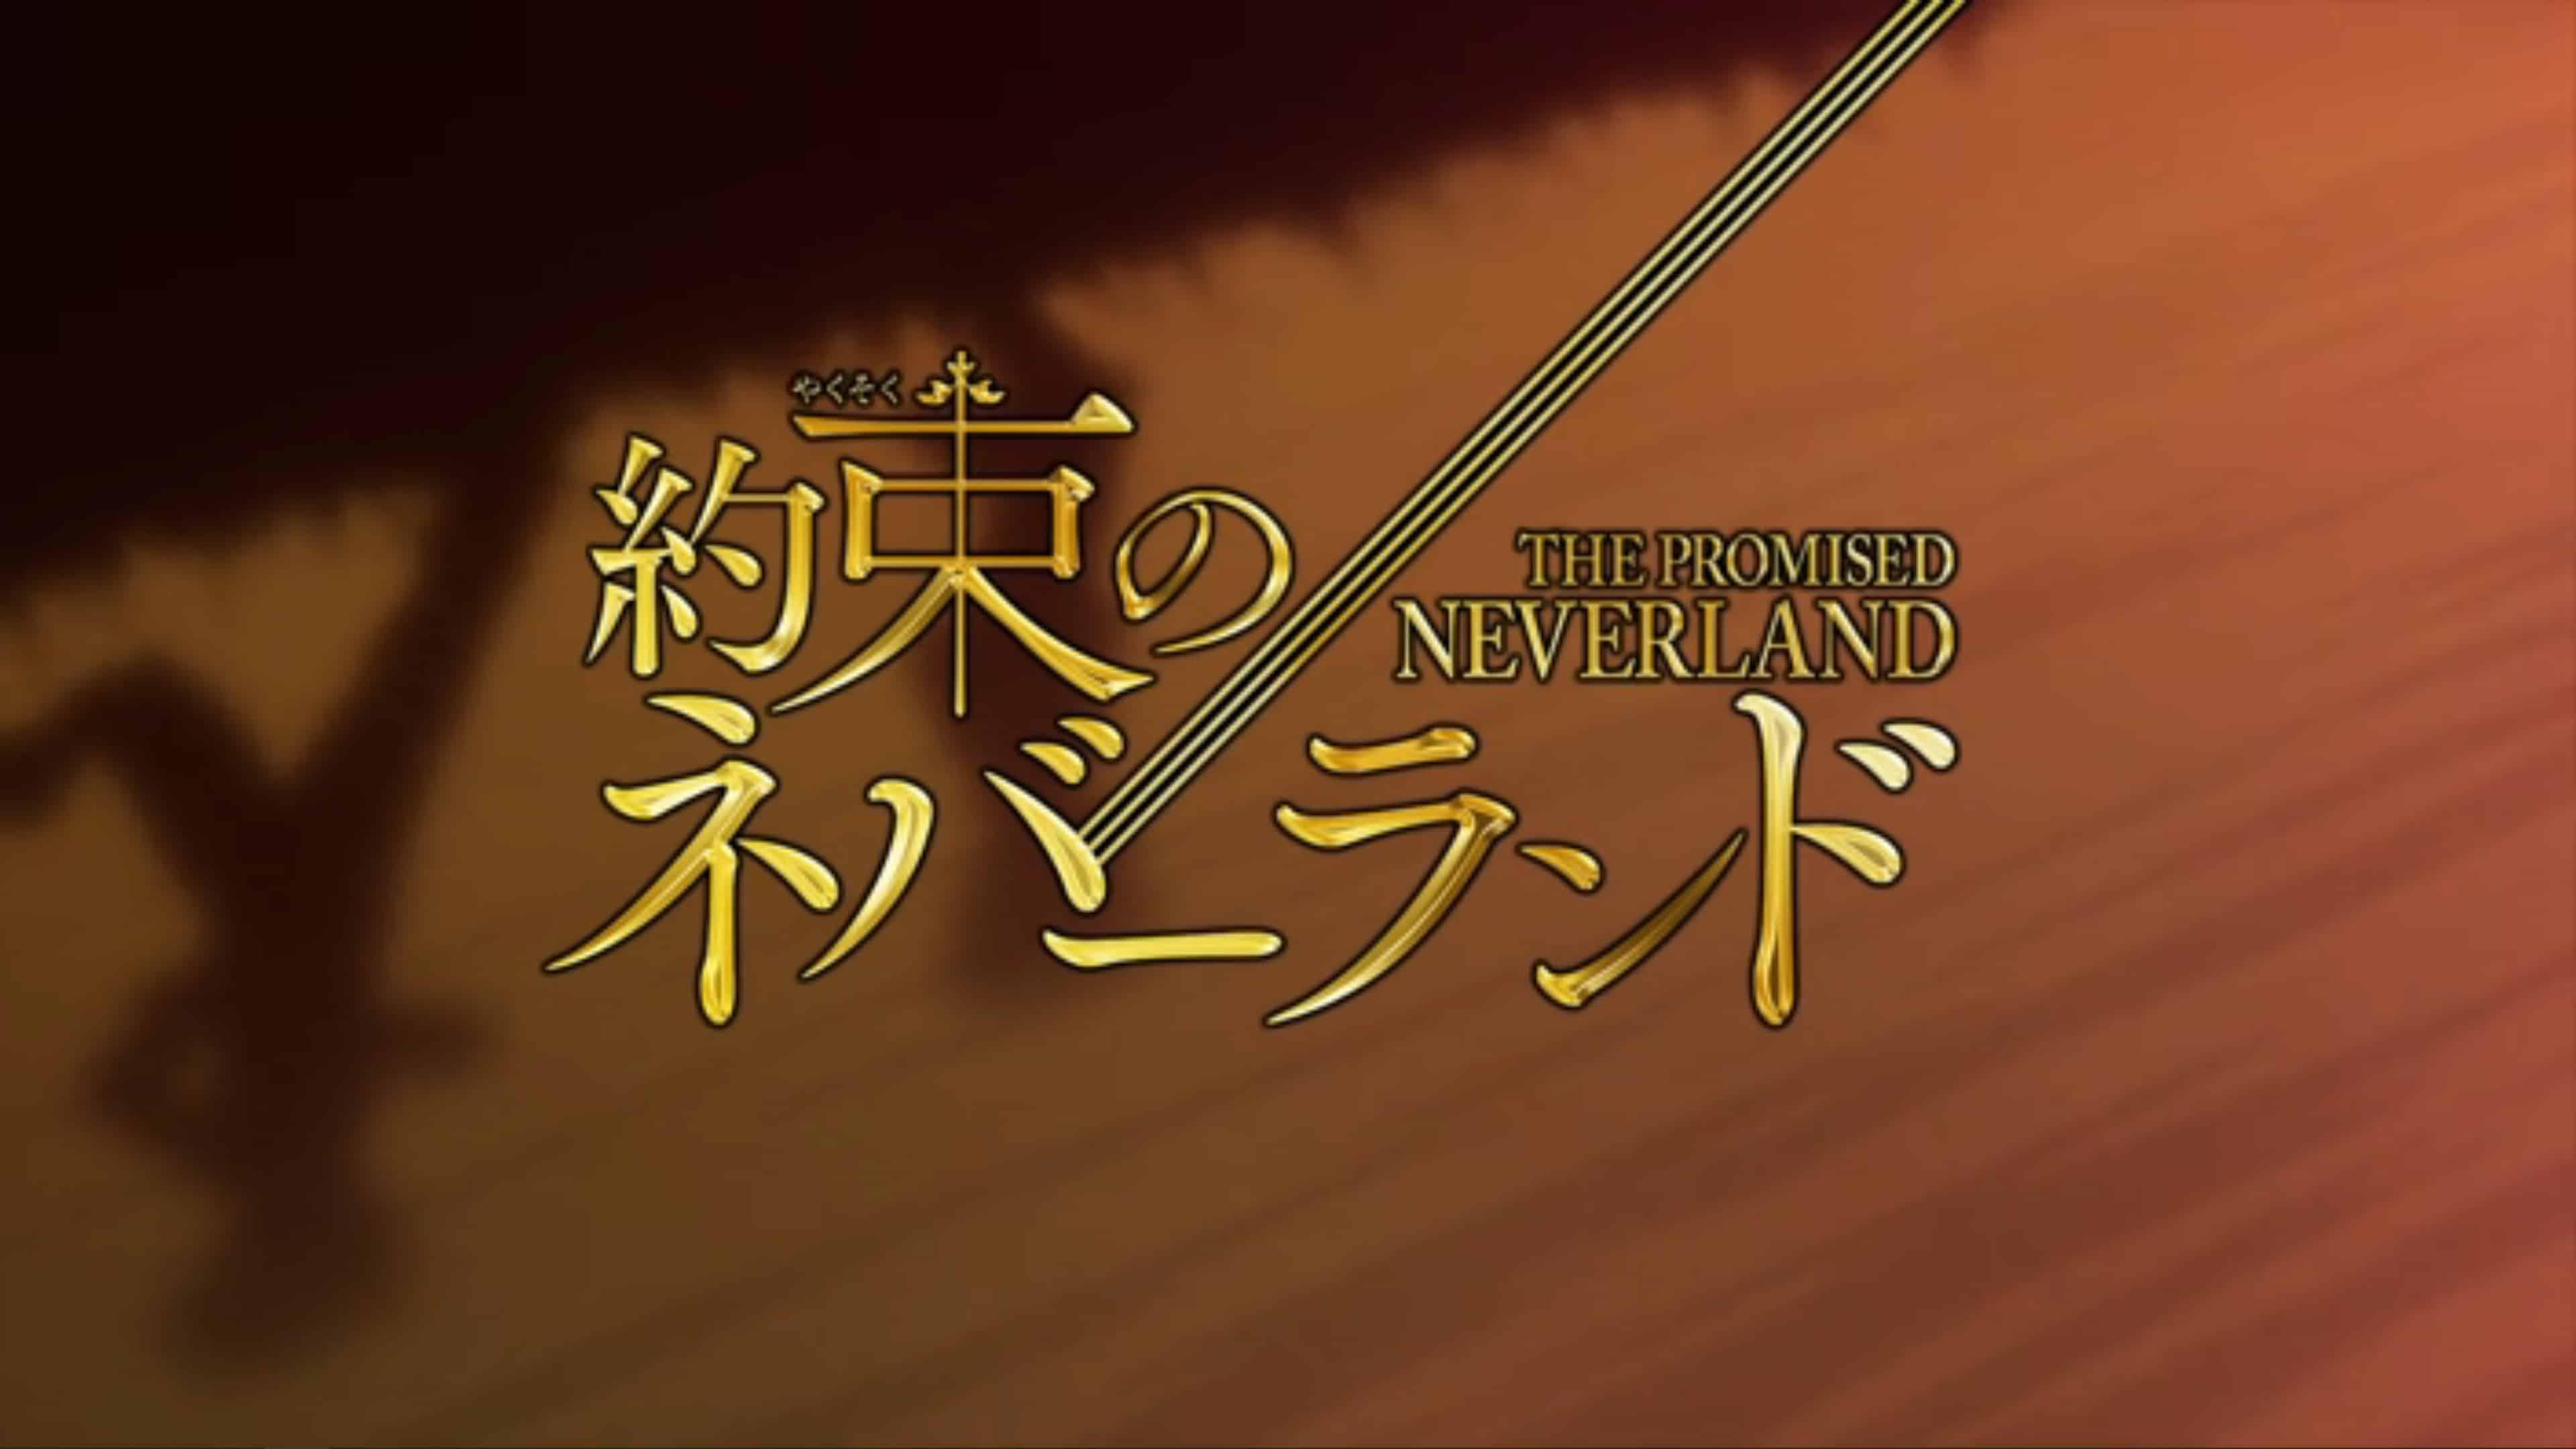 Title Card - The Promised Neverland Season 2